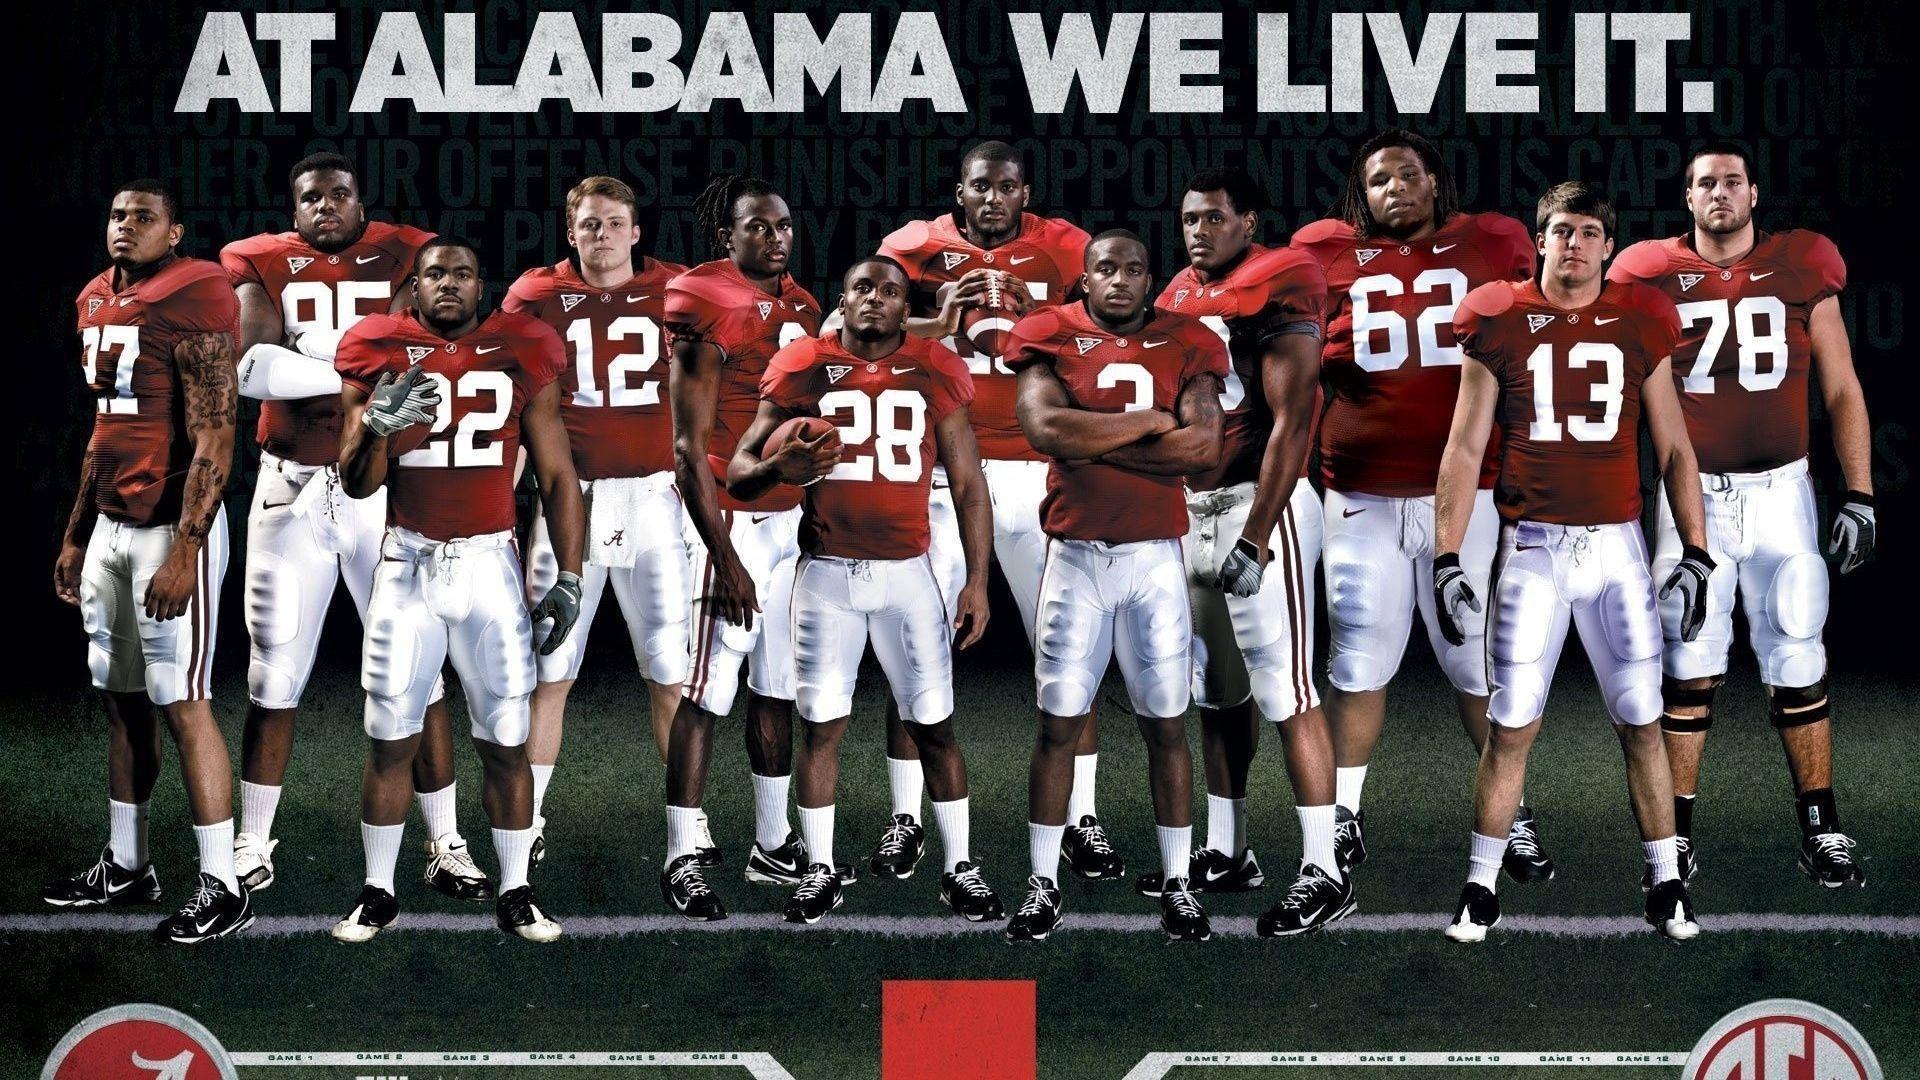 Alabama Football Screensavers and